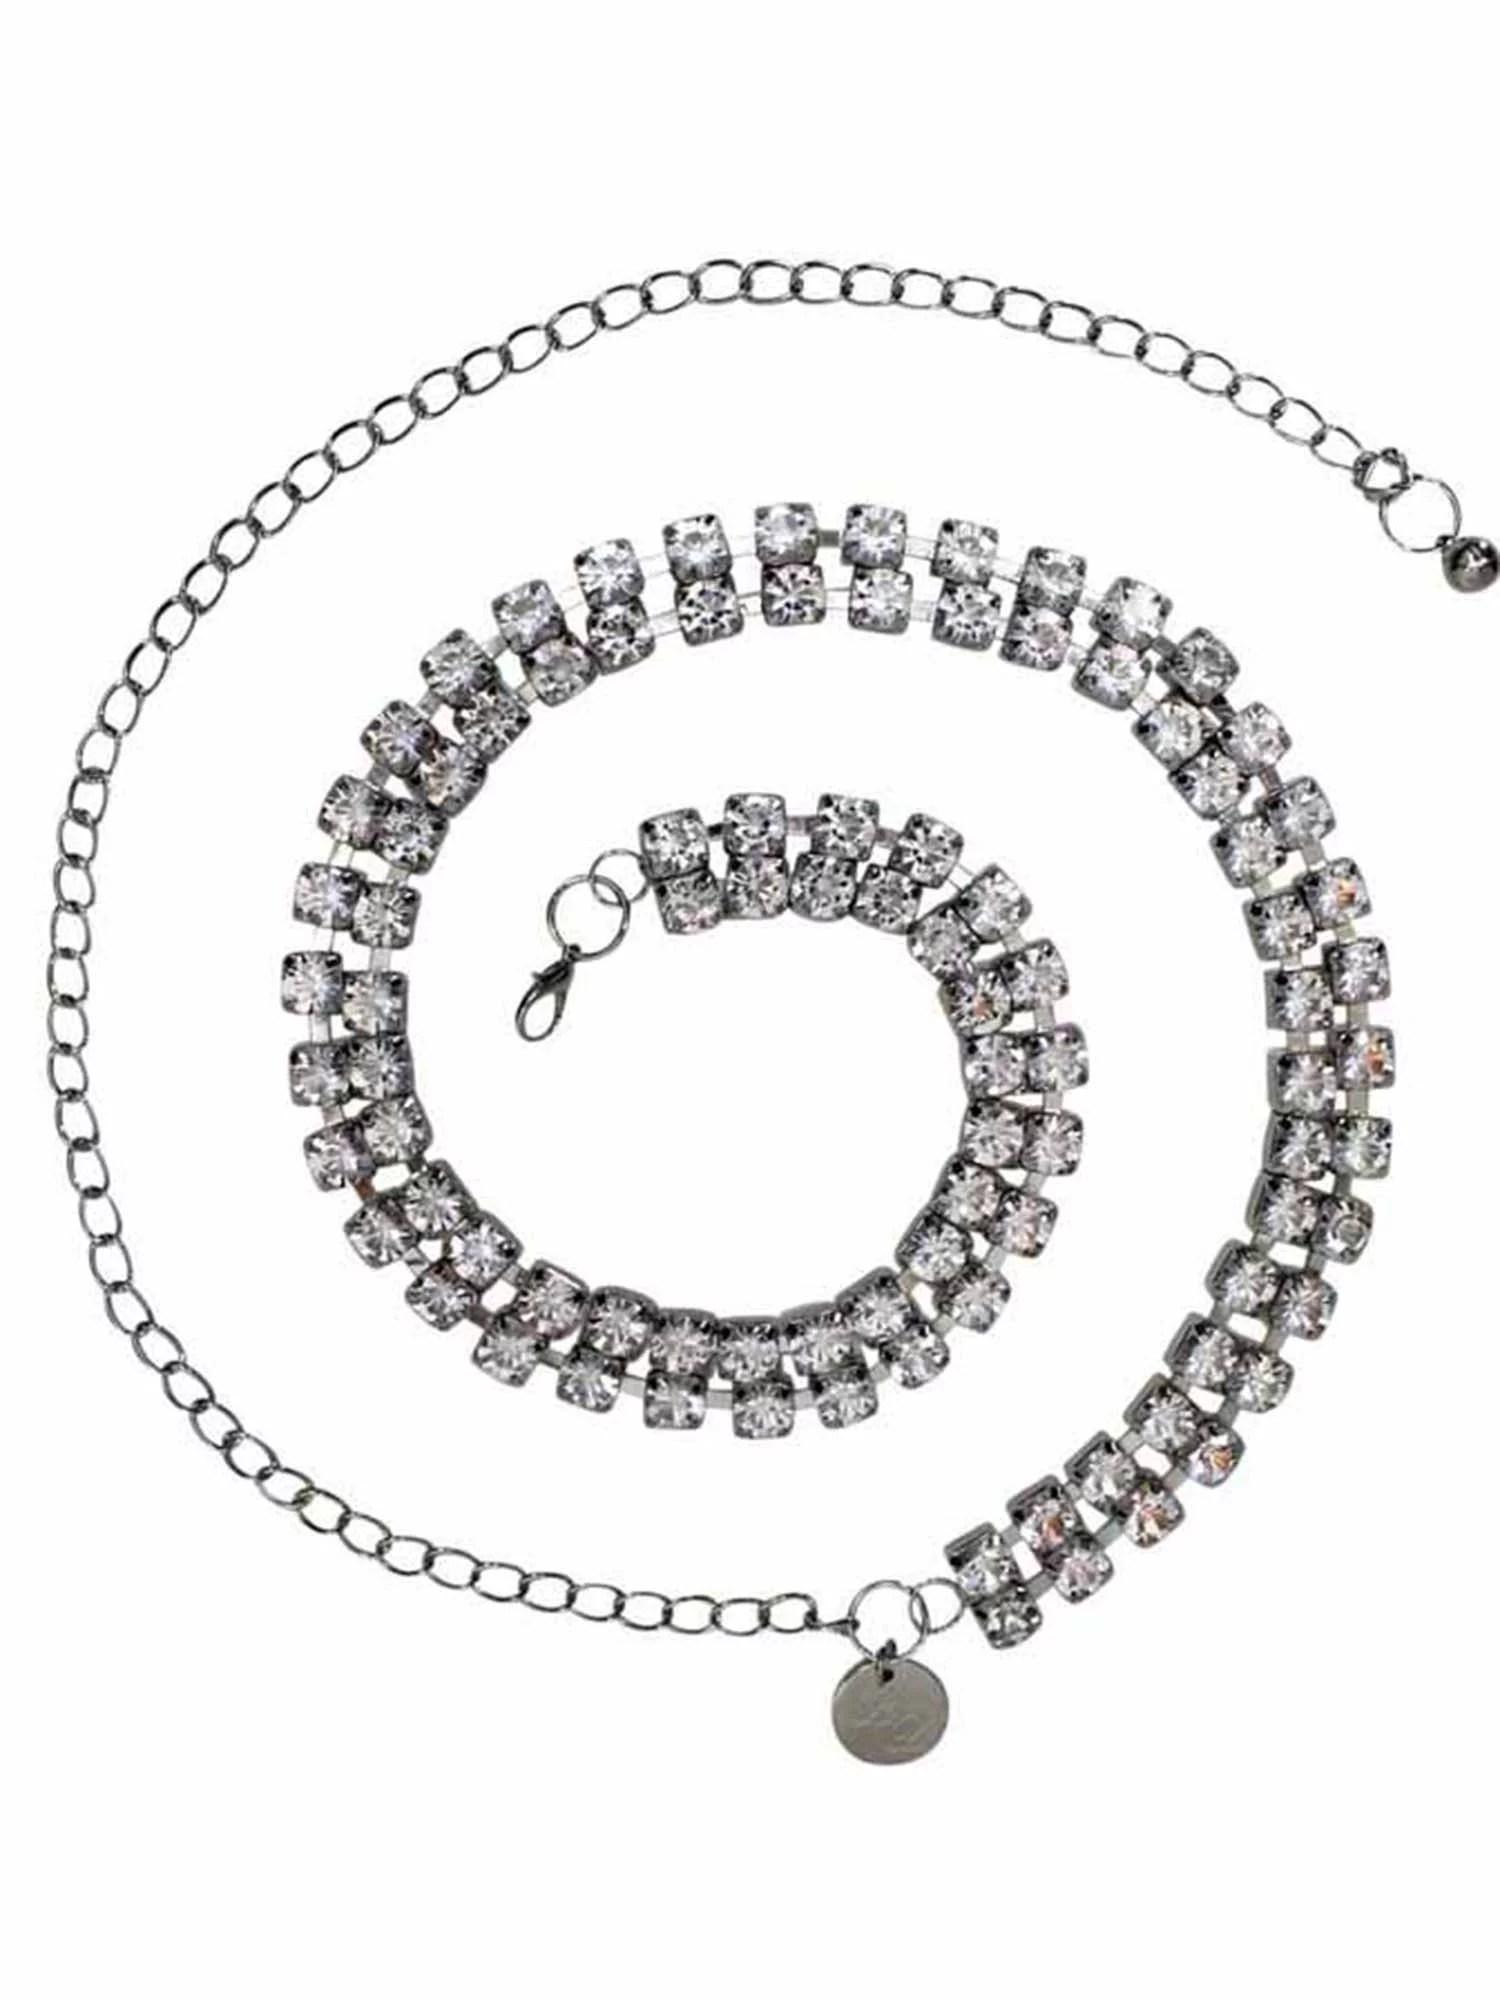 Silver Double Row Crystal Rhinestone Chain Link Belt